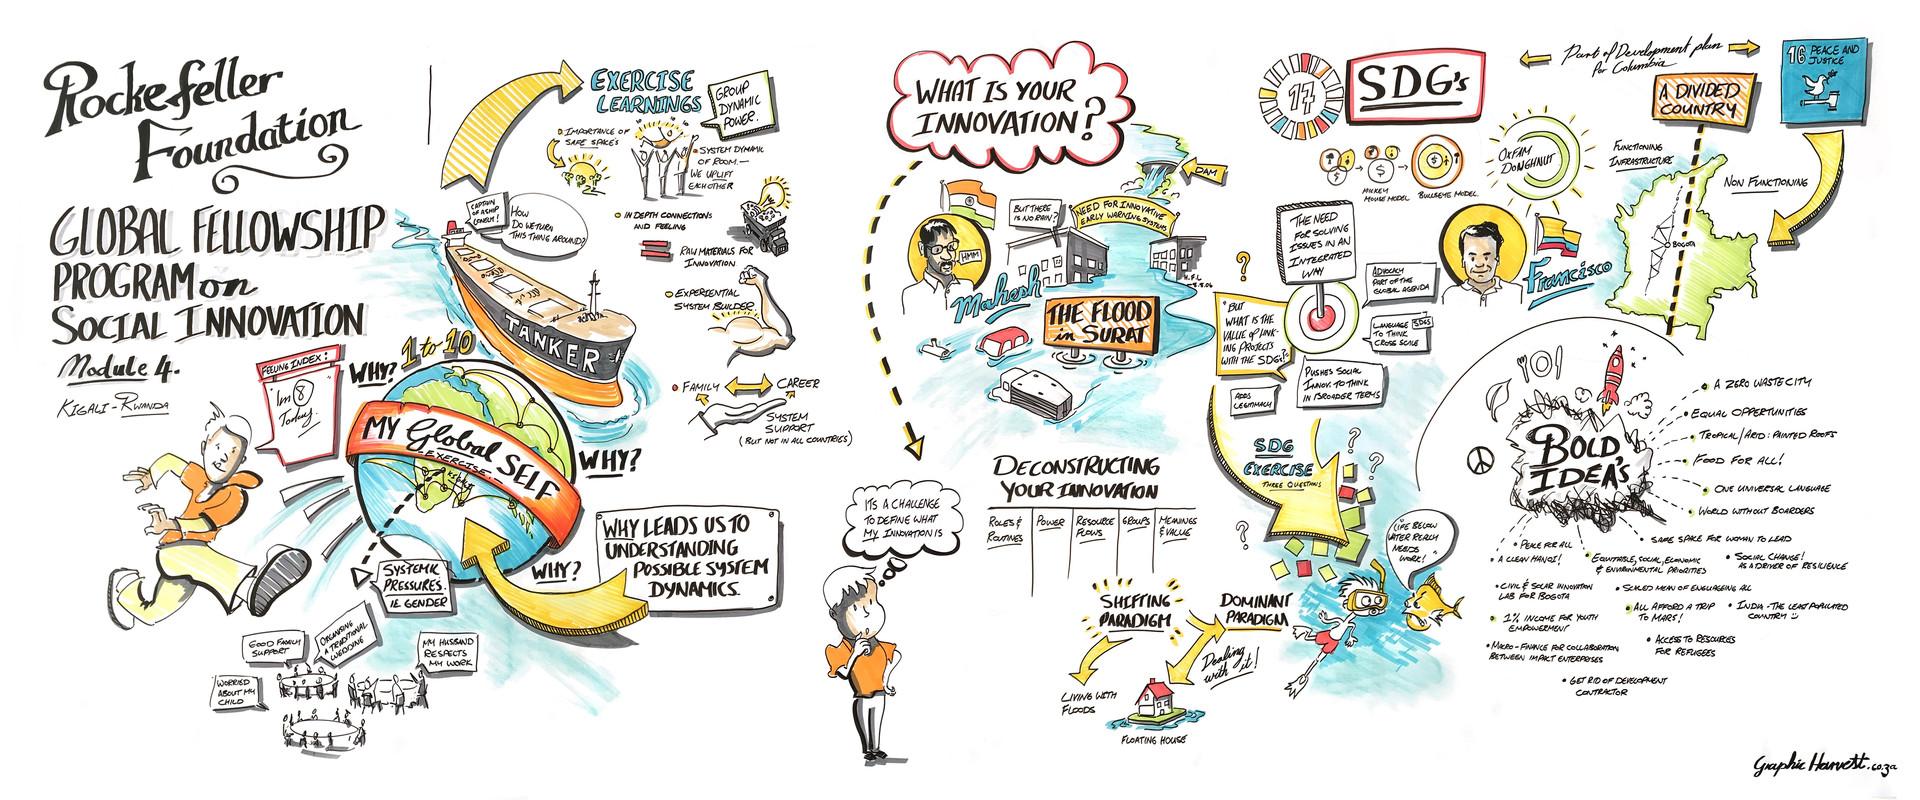 Rockerfeller Foundation - Global Fellowship on Social Innovation